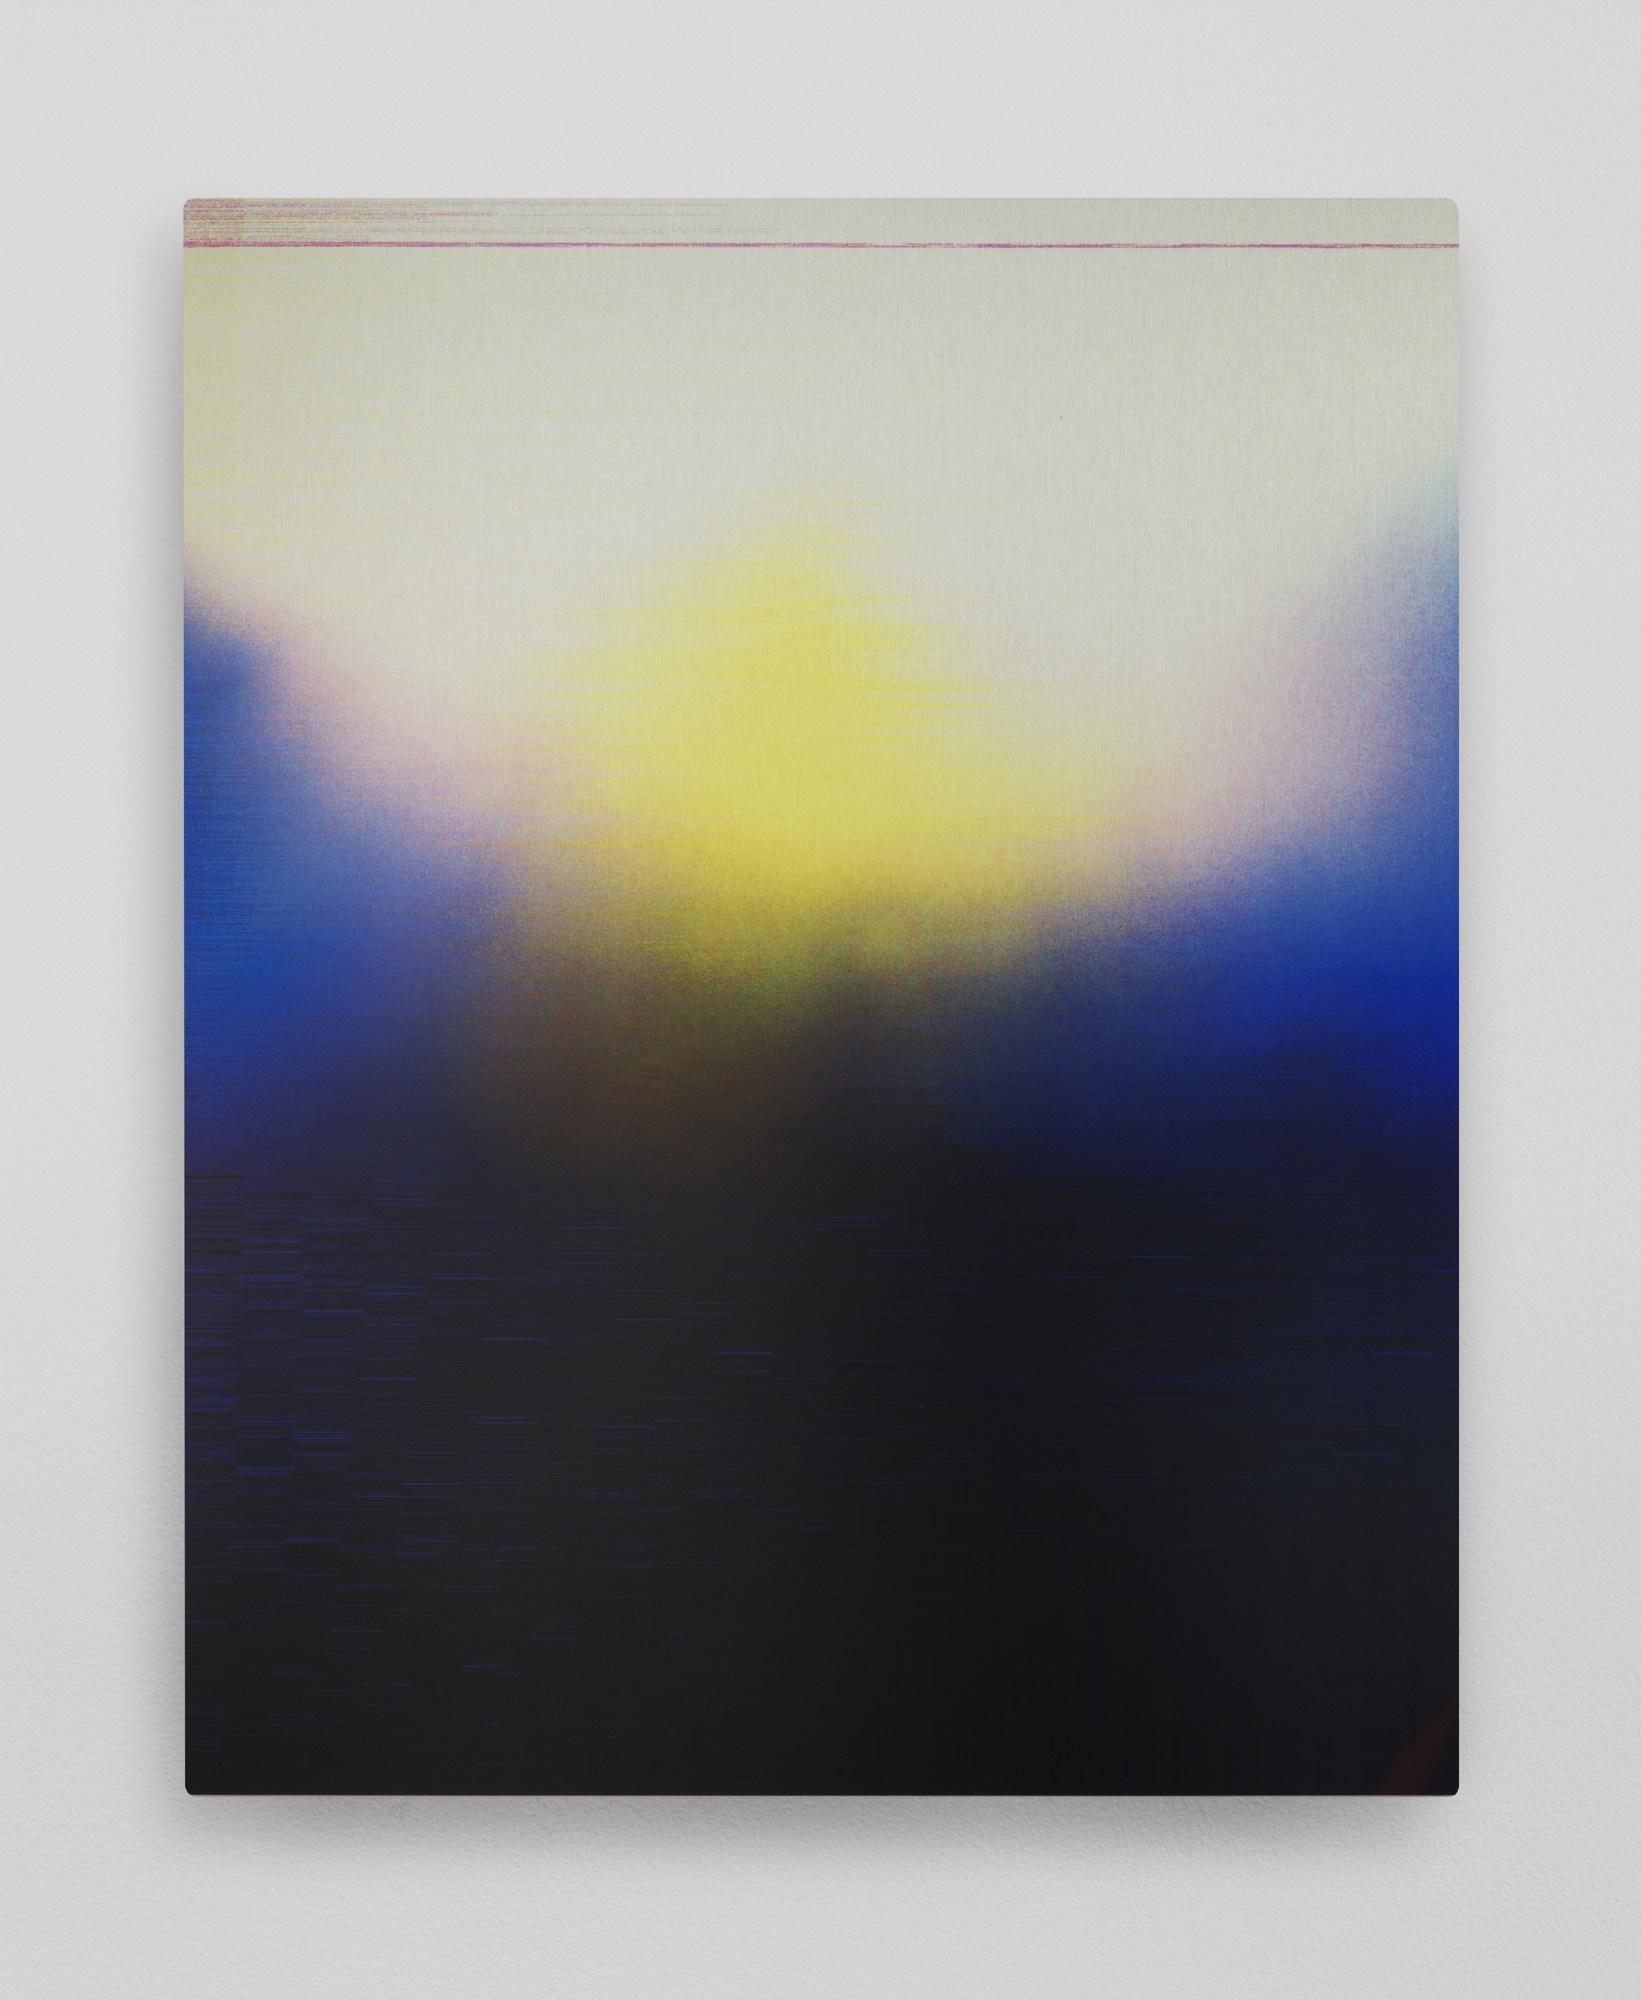 James Hoff, Skywiper No. 28, 2015